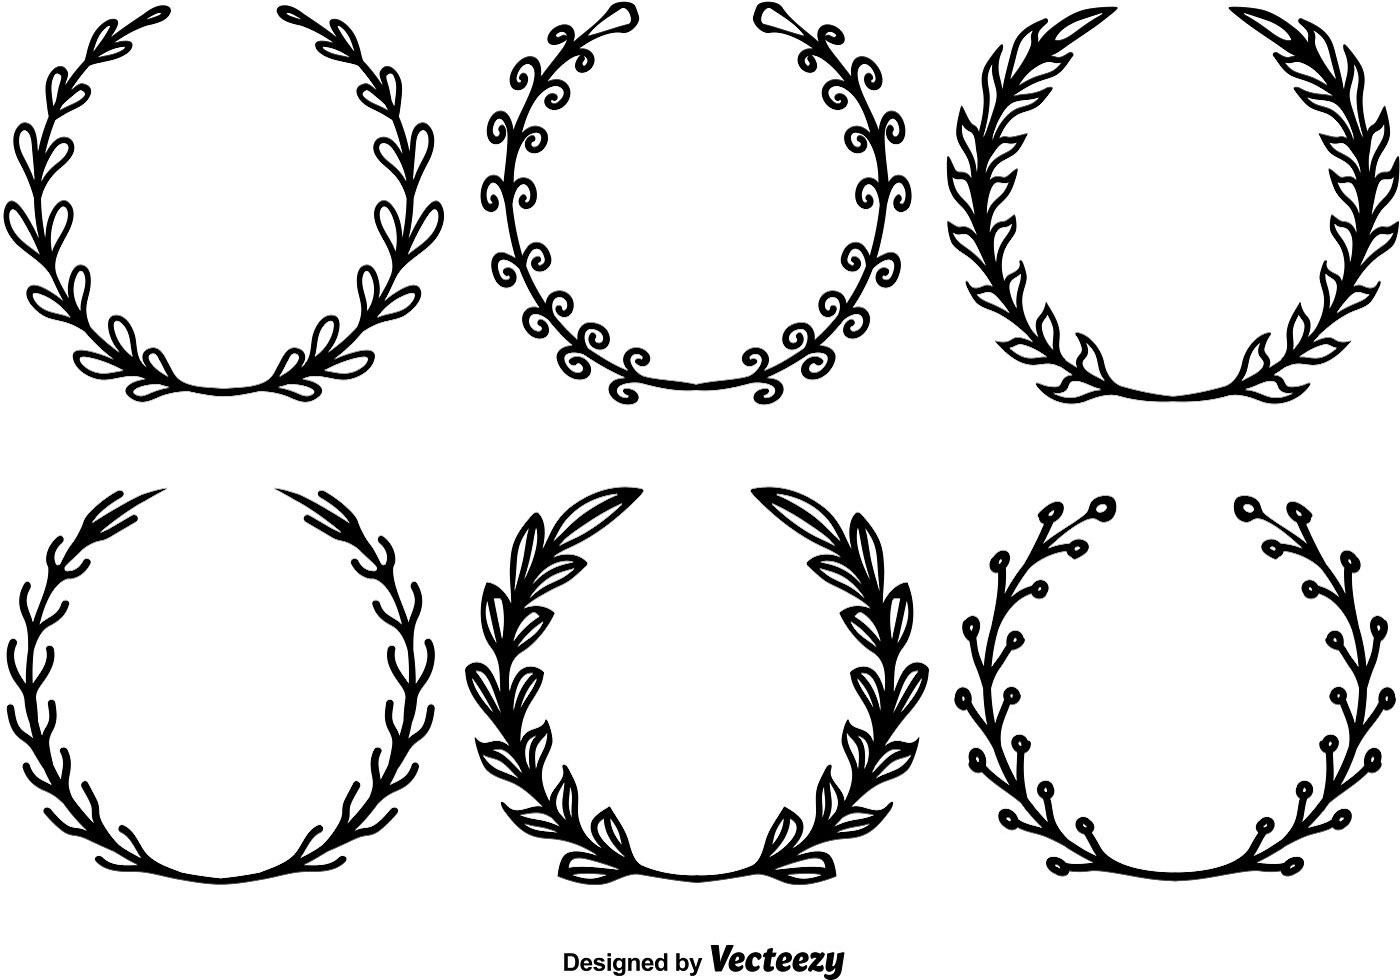 Hand Drawn Wreath Vectors